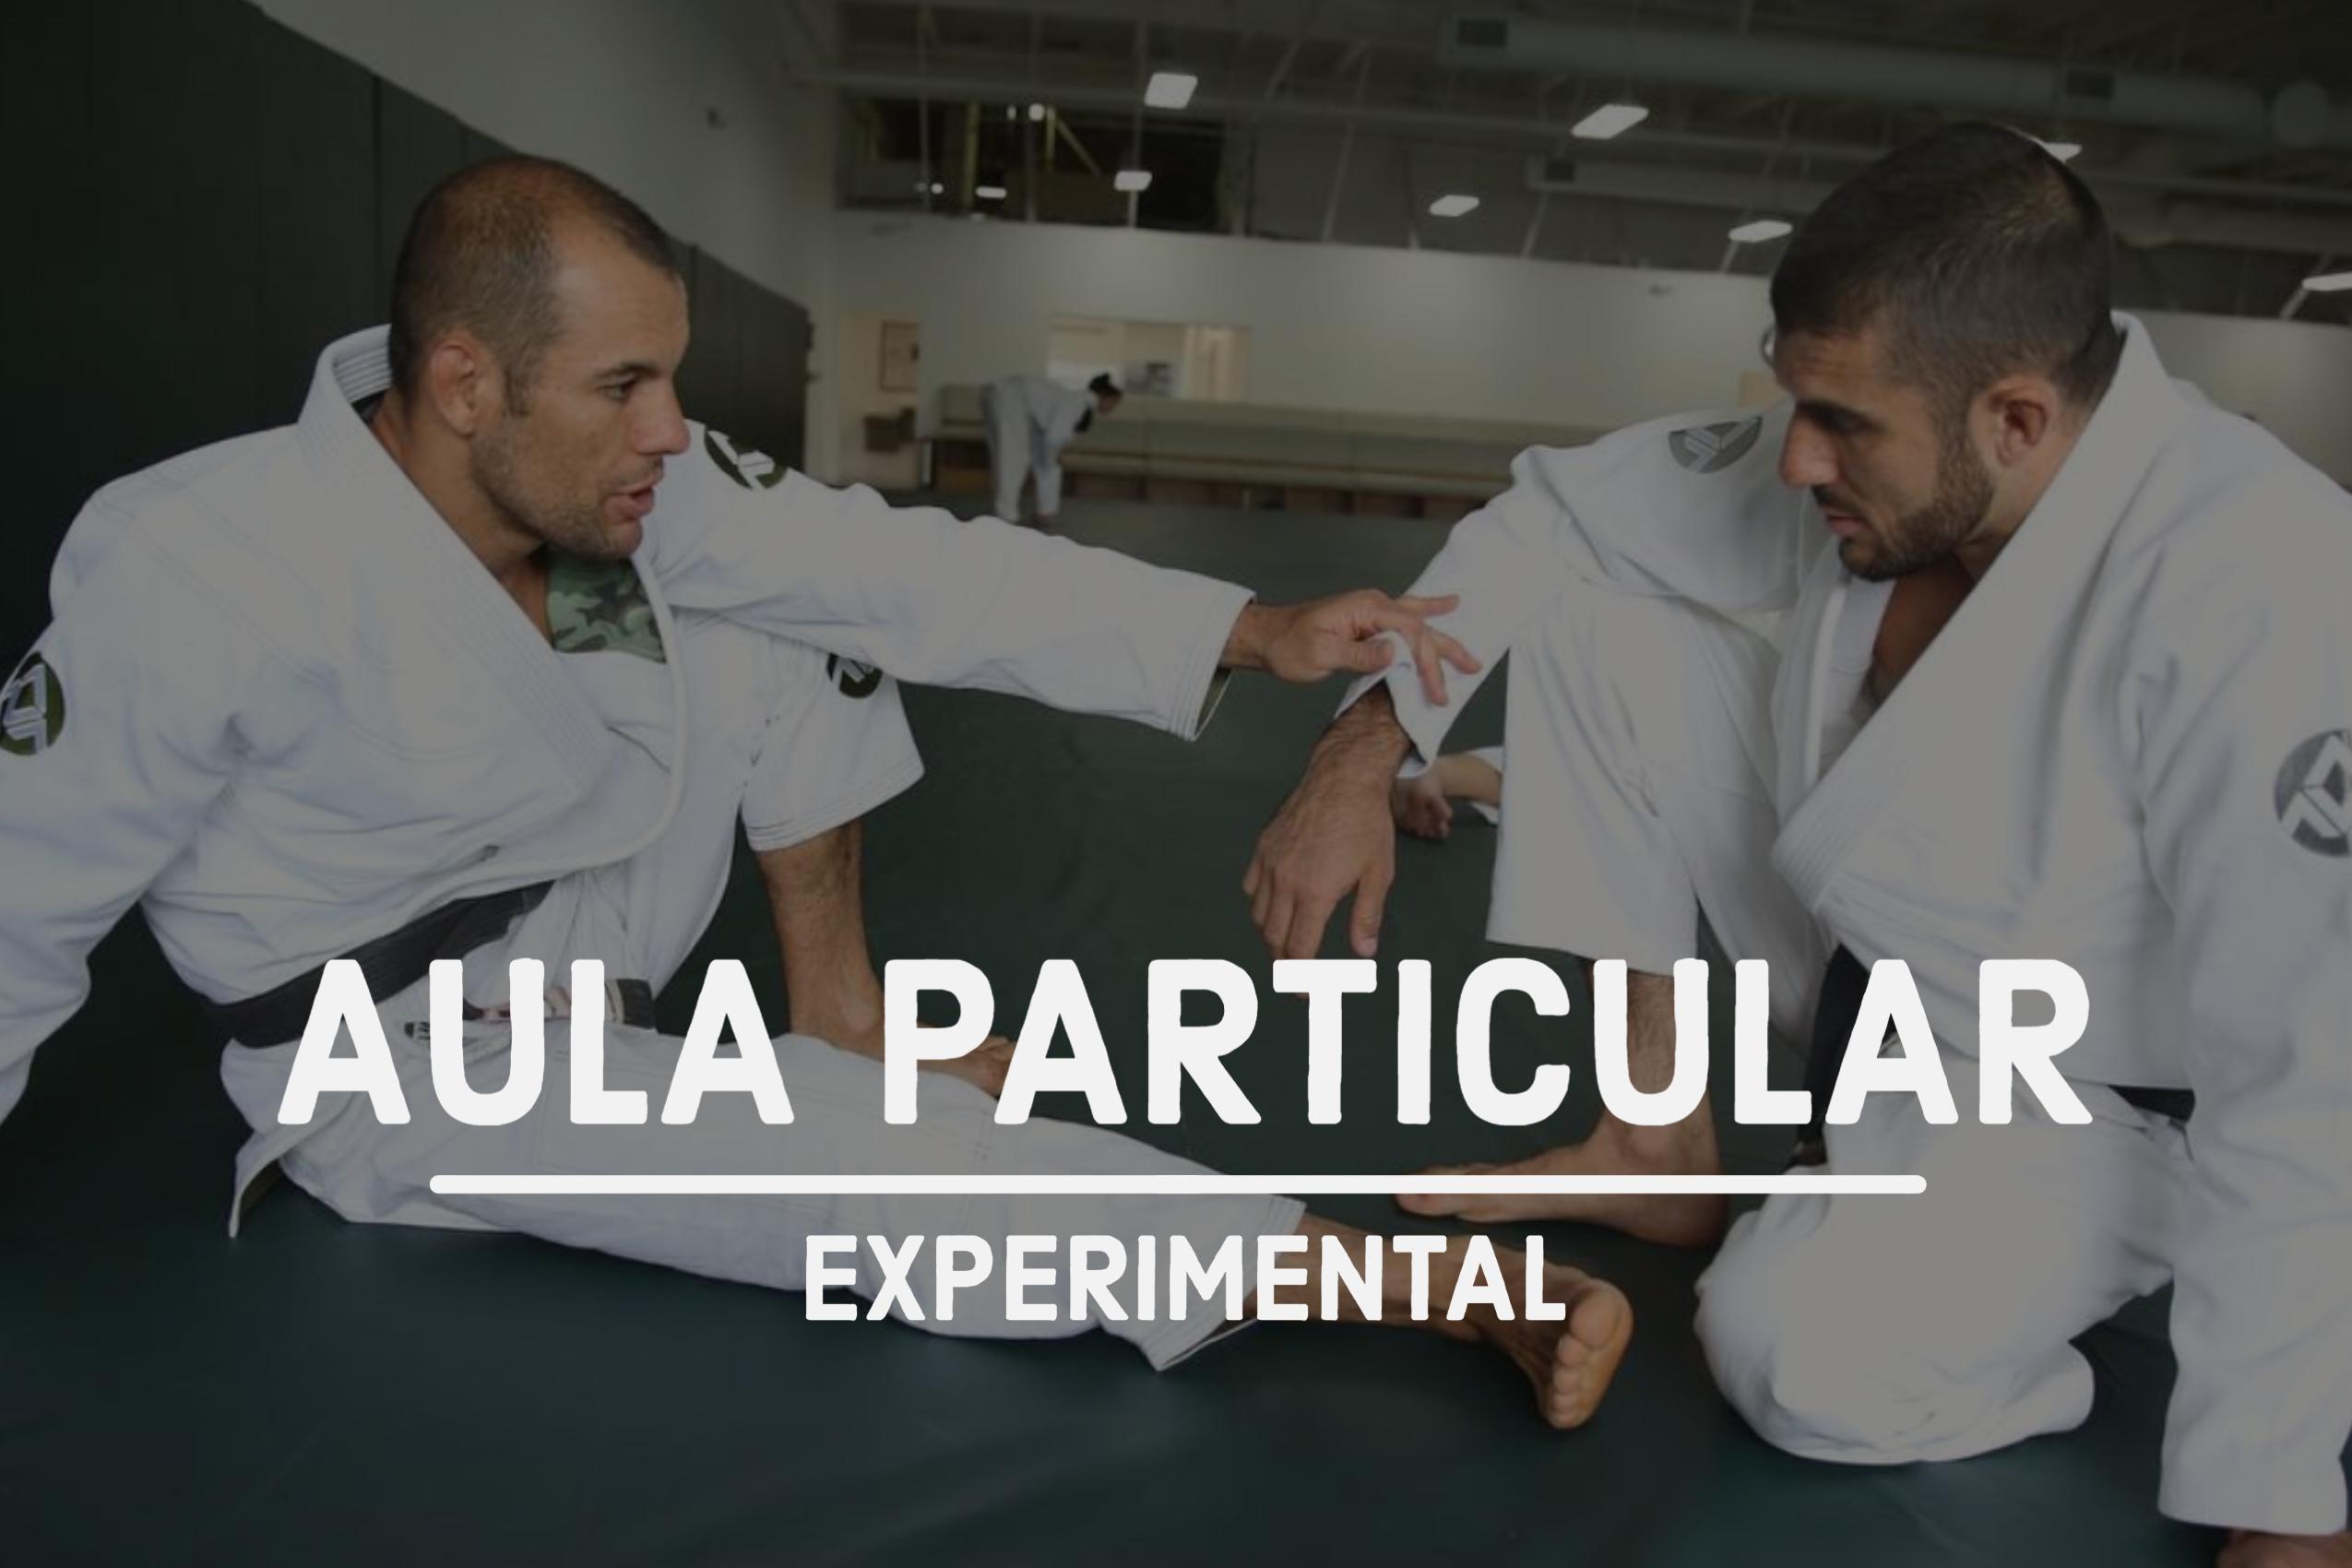 Aula Particular (Experimental)